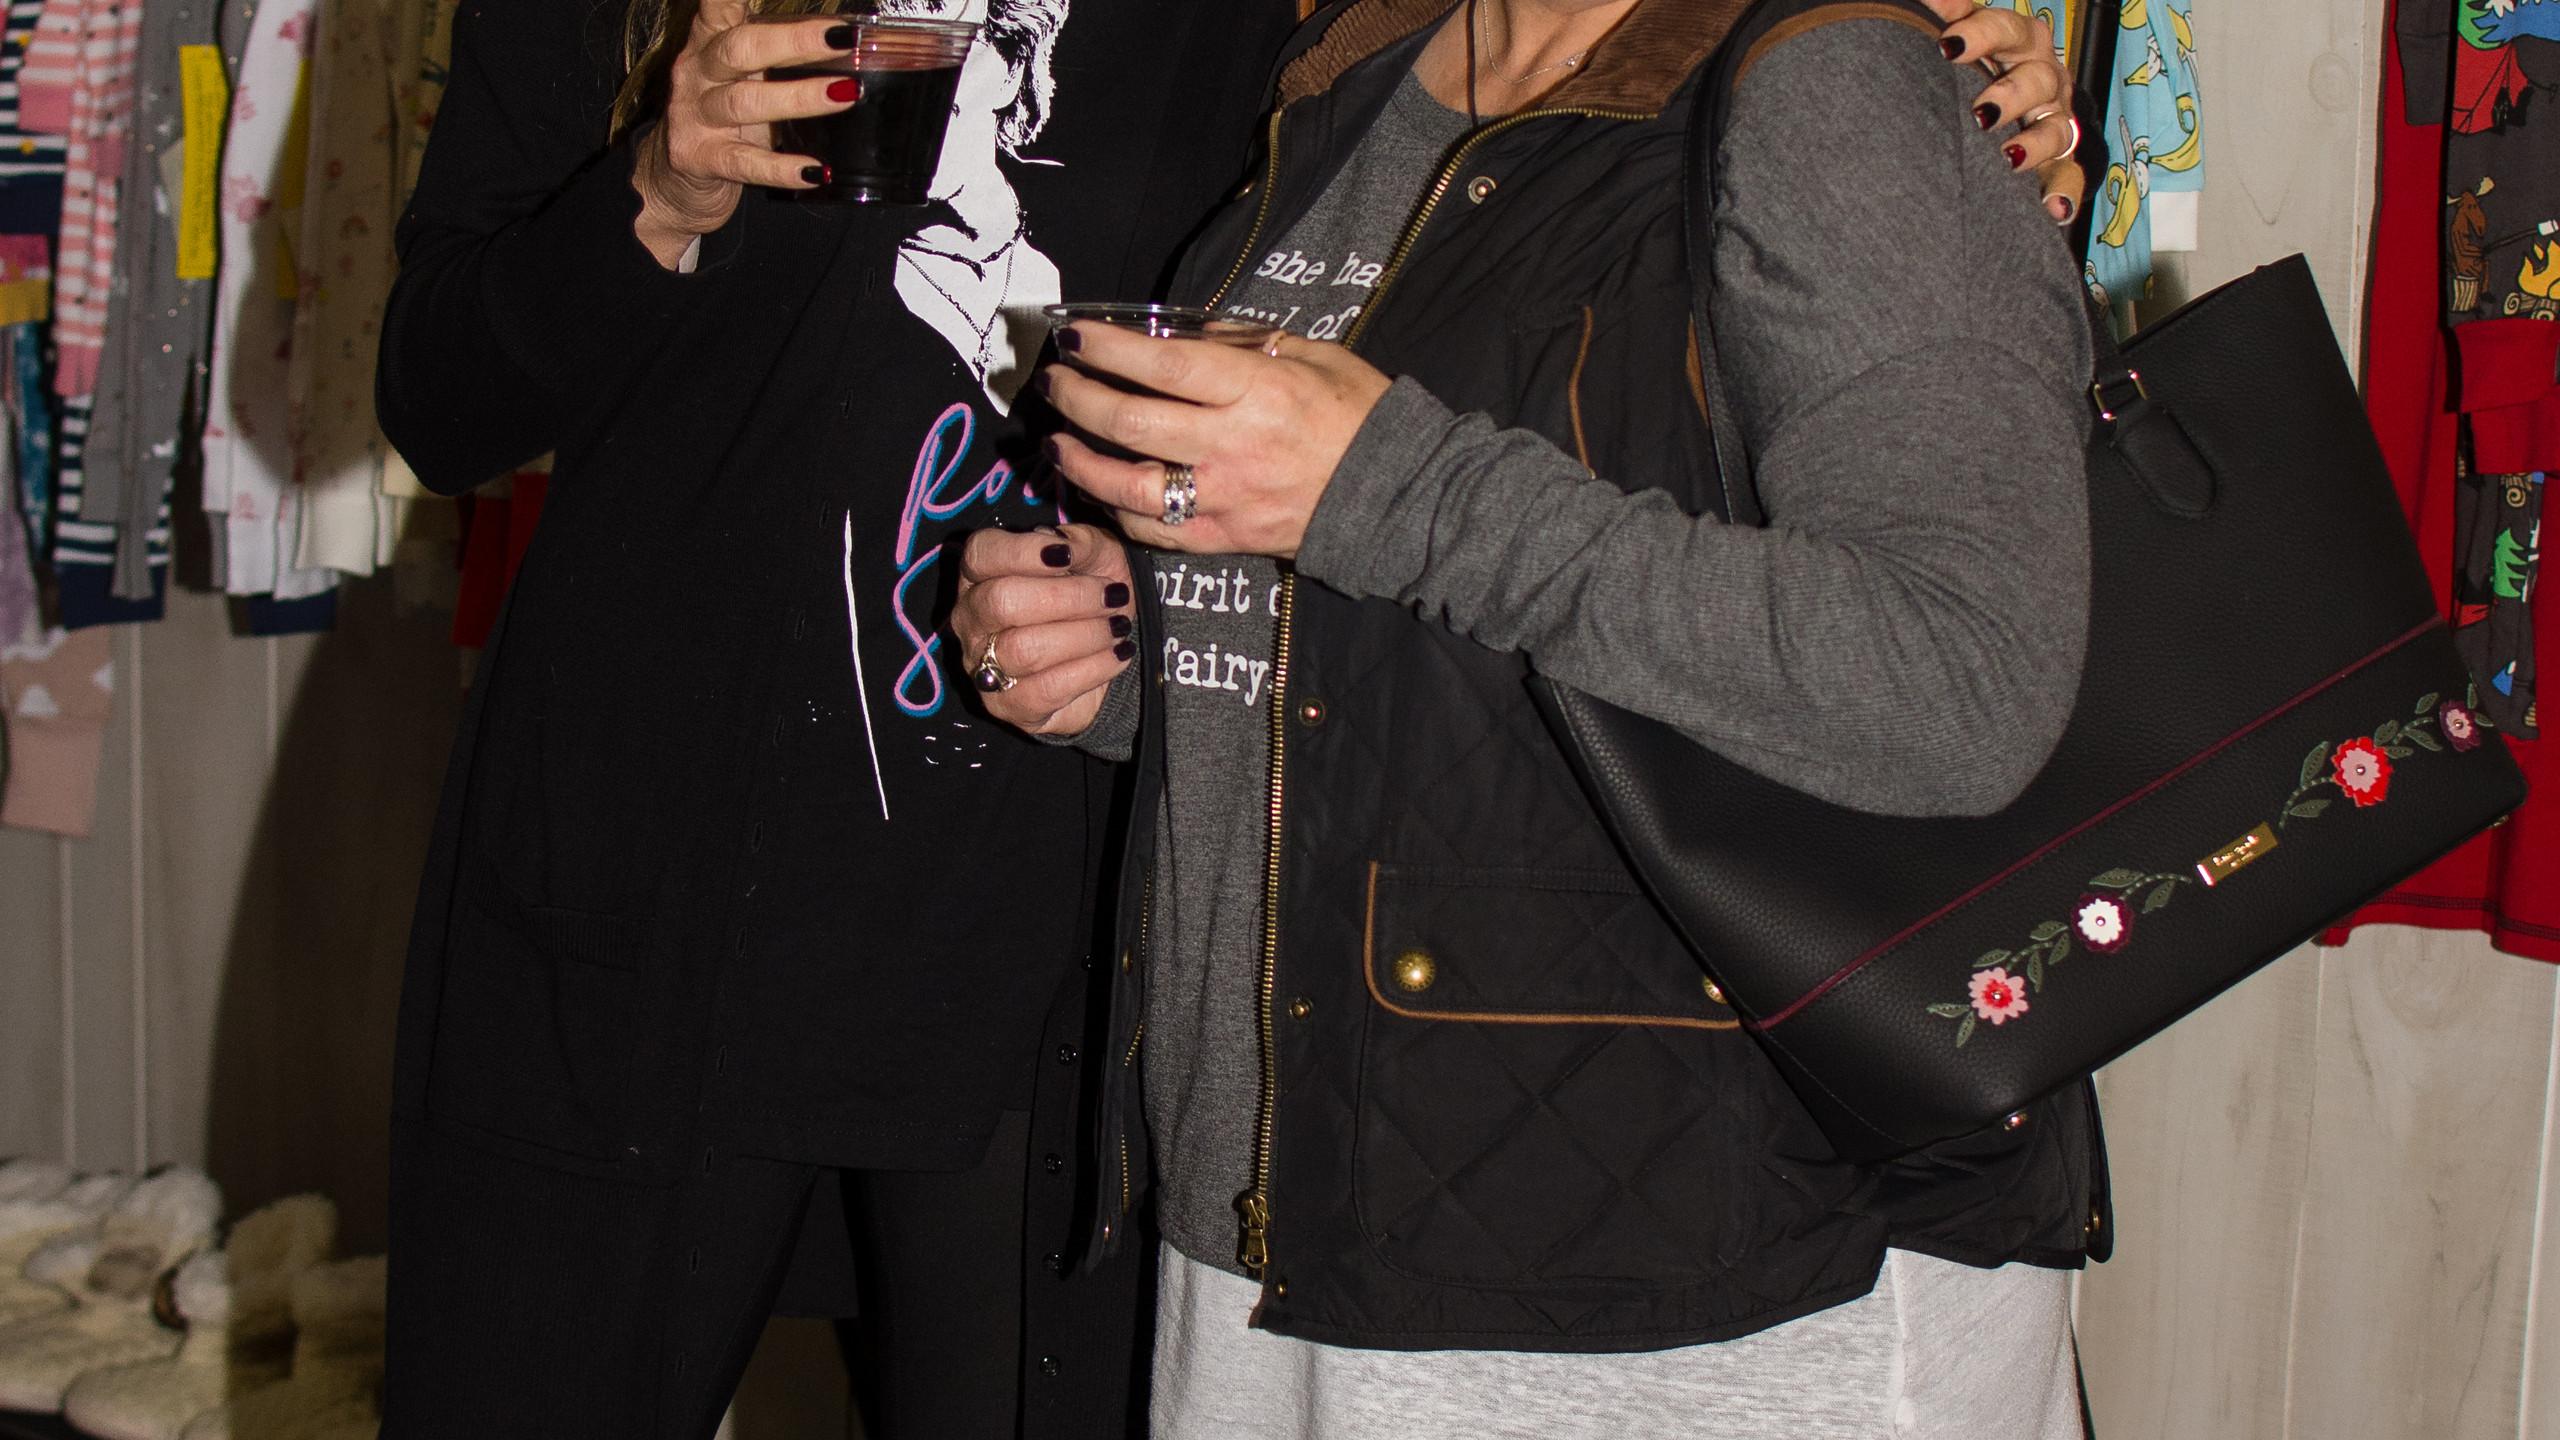 Joy Huggins and Sharon Reyman